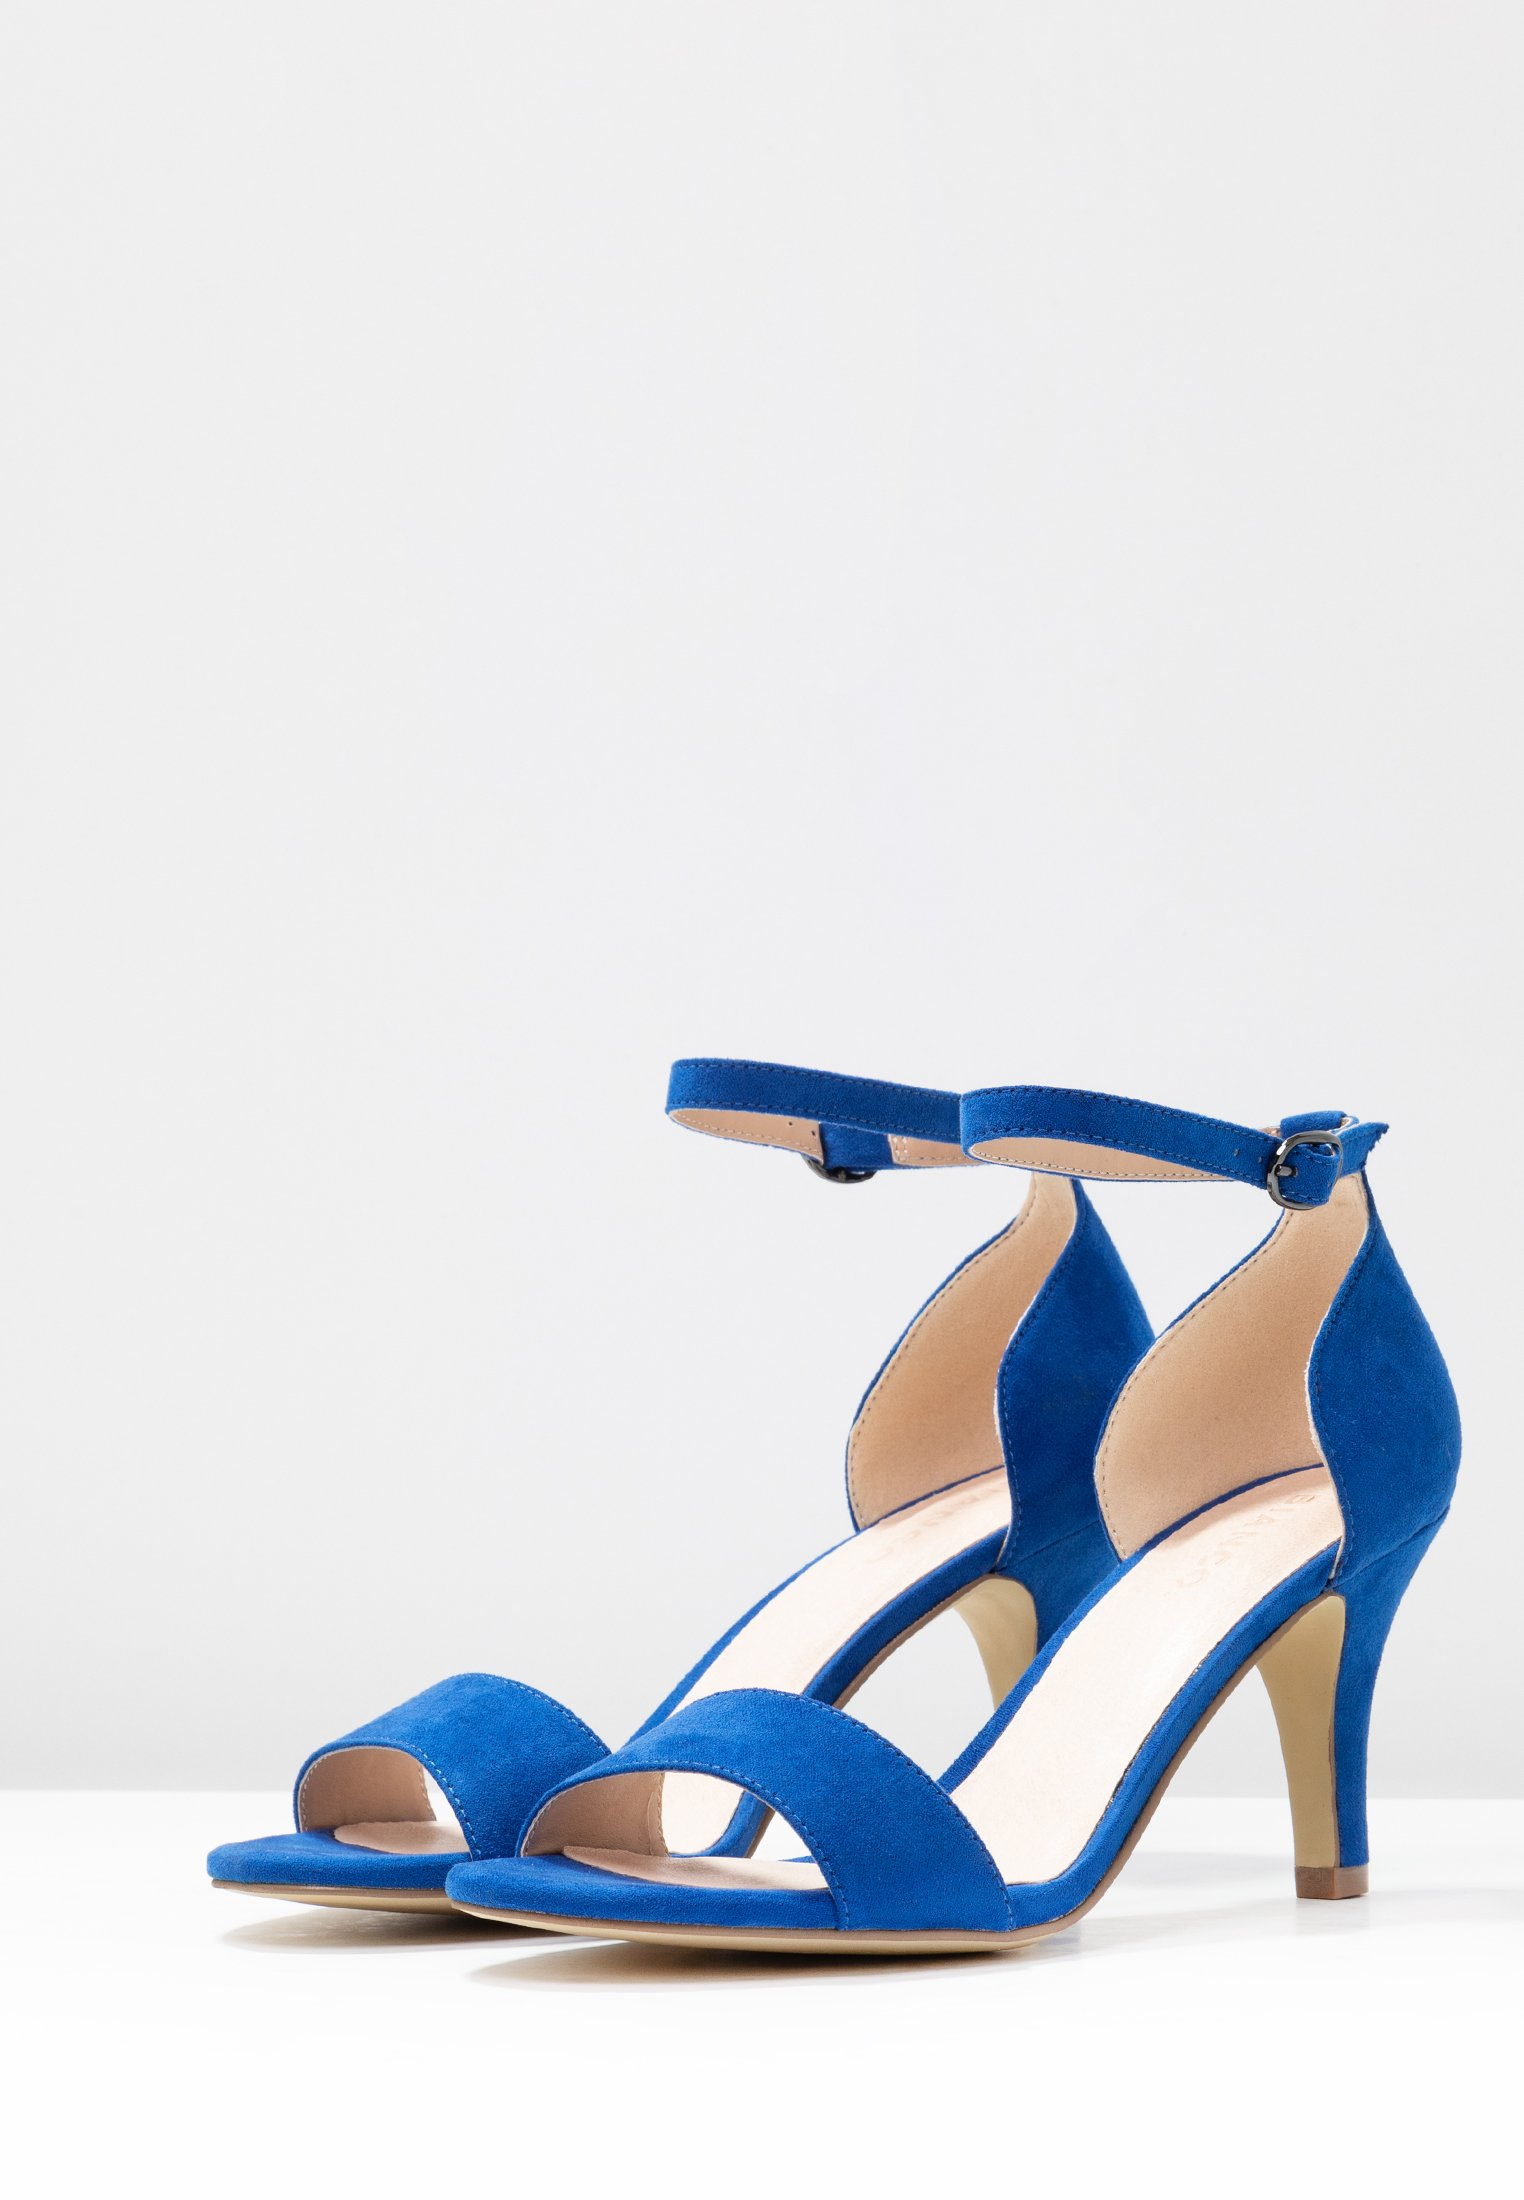 BIAADORE BASIC Sandaler colbat blue